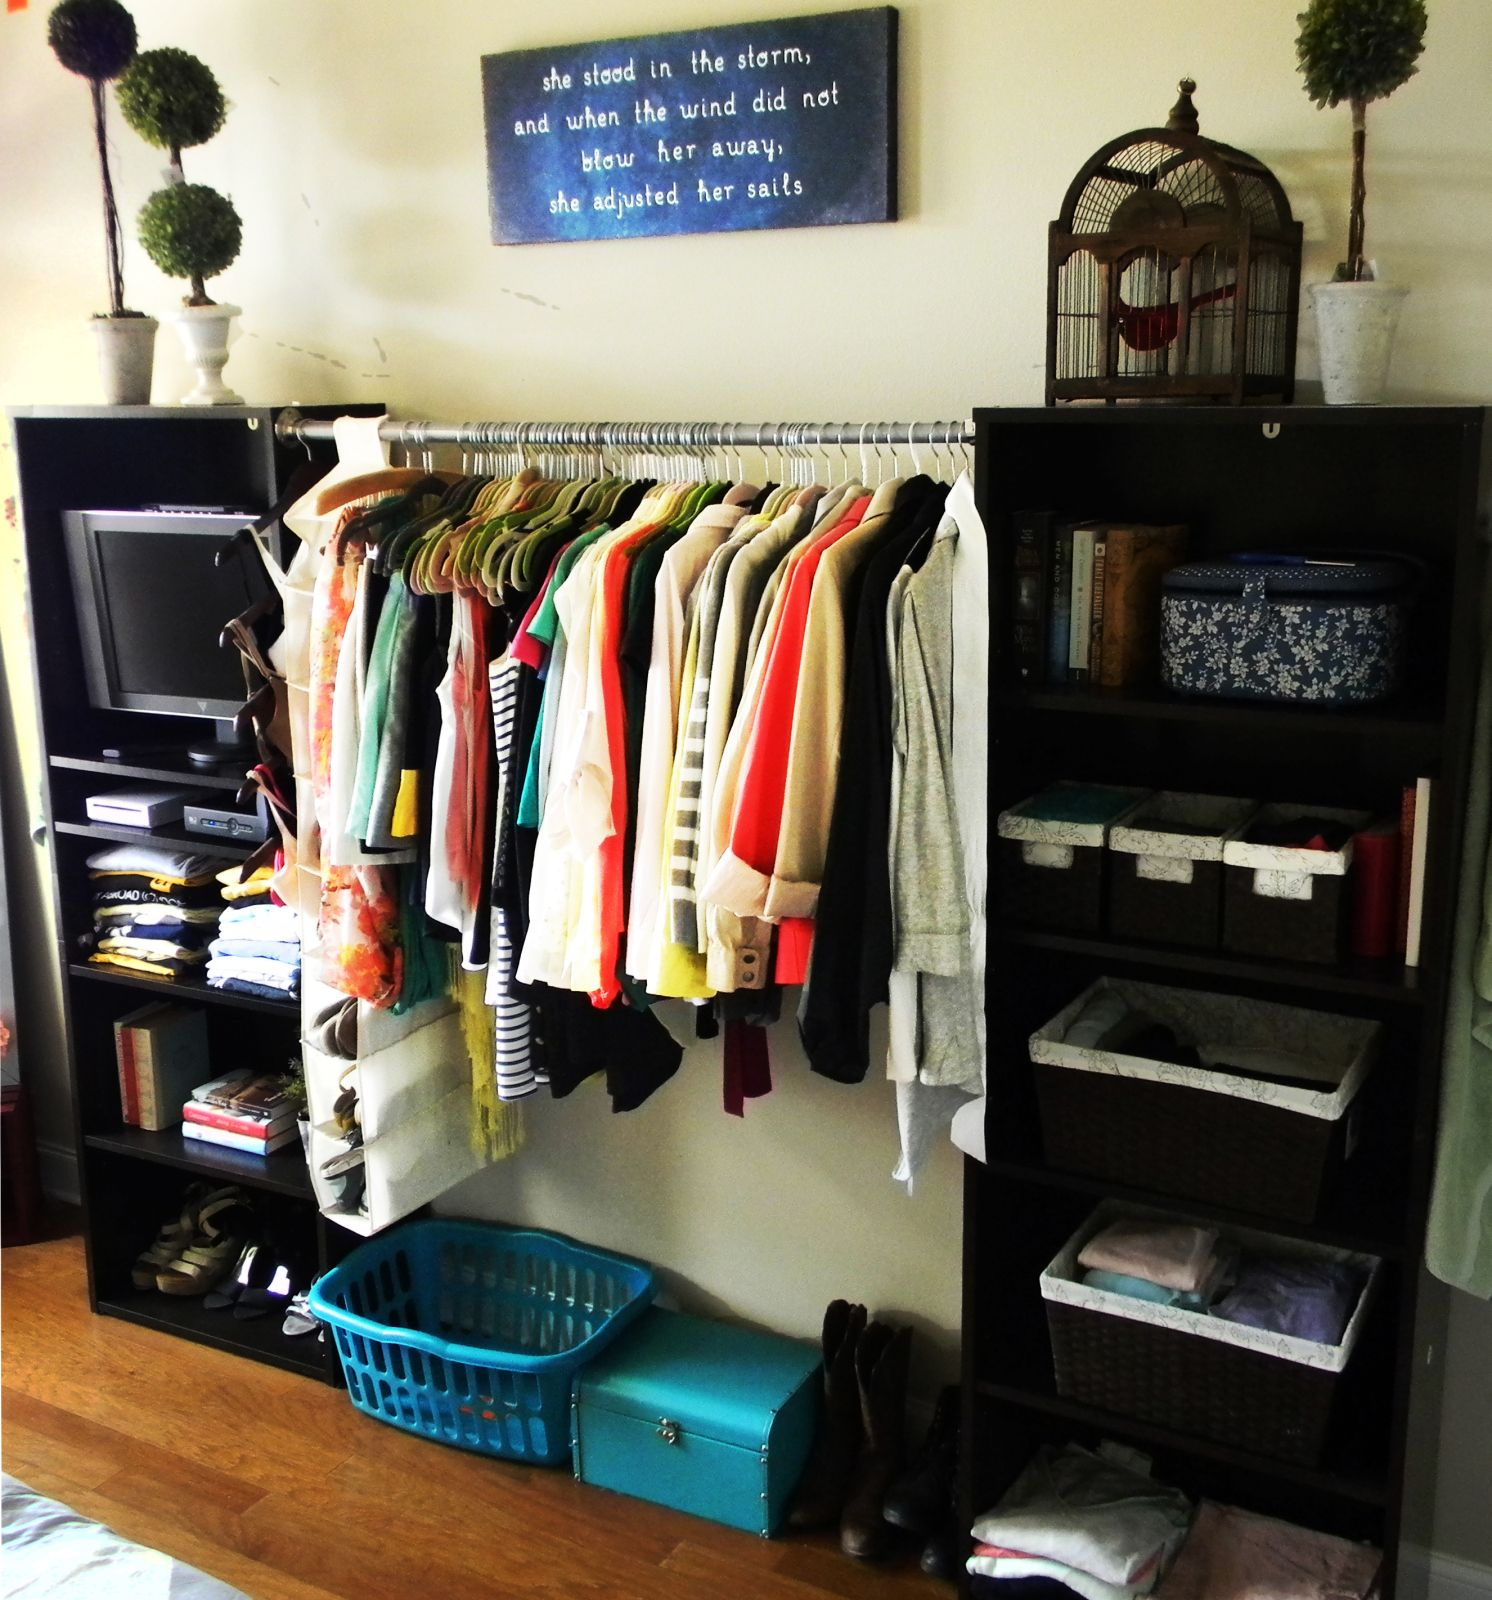 The 25 best no closet solutions ideas on pinterest diy - Clothing storage ideas no closet ...